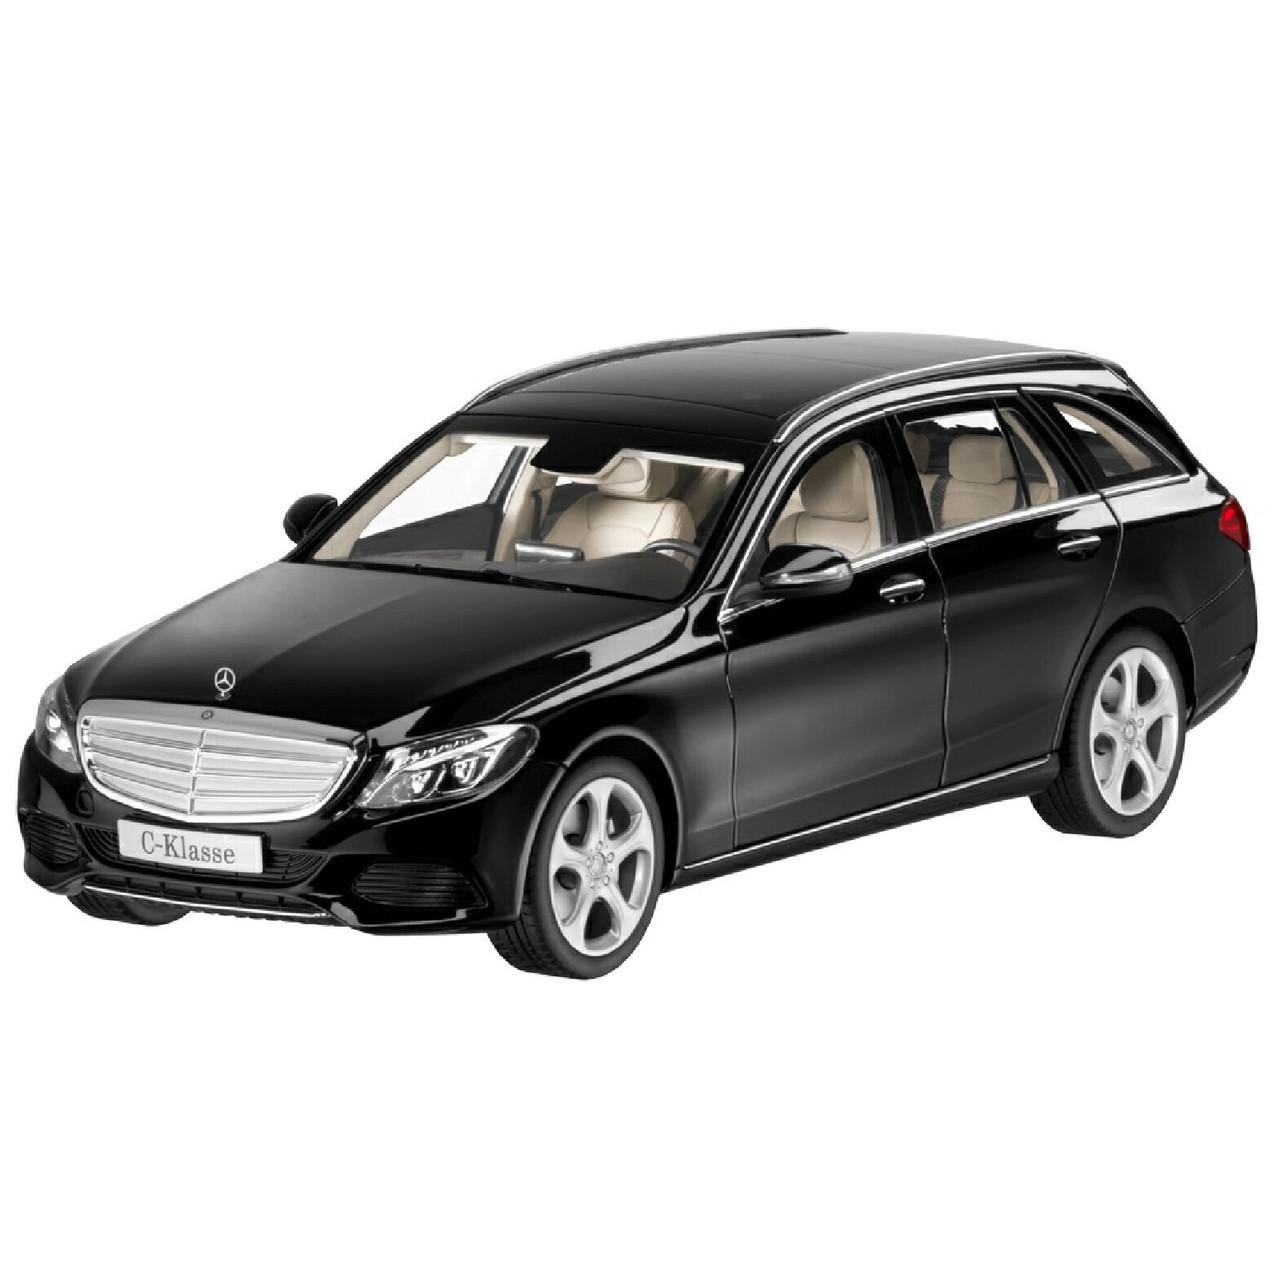 Модель автомобіля Mercedes C-Class Estate, Exclusive, Scale 1:18, Black, артикул B66960259